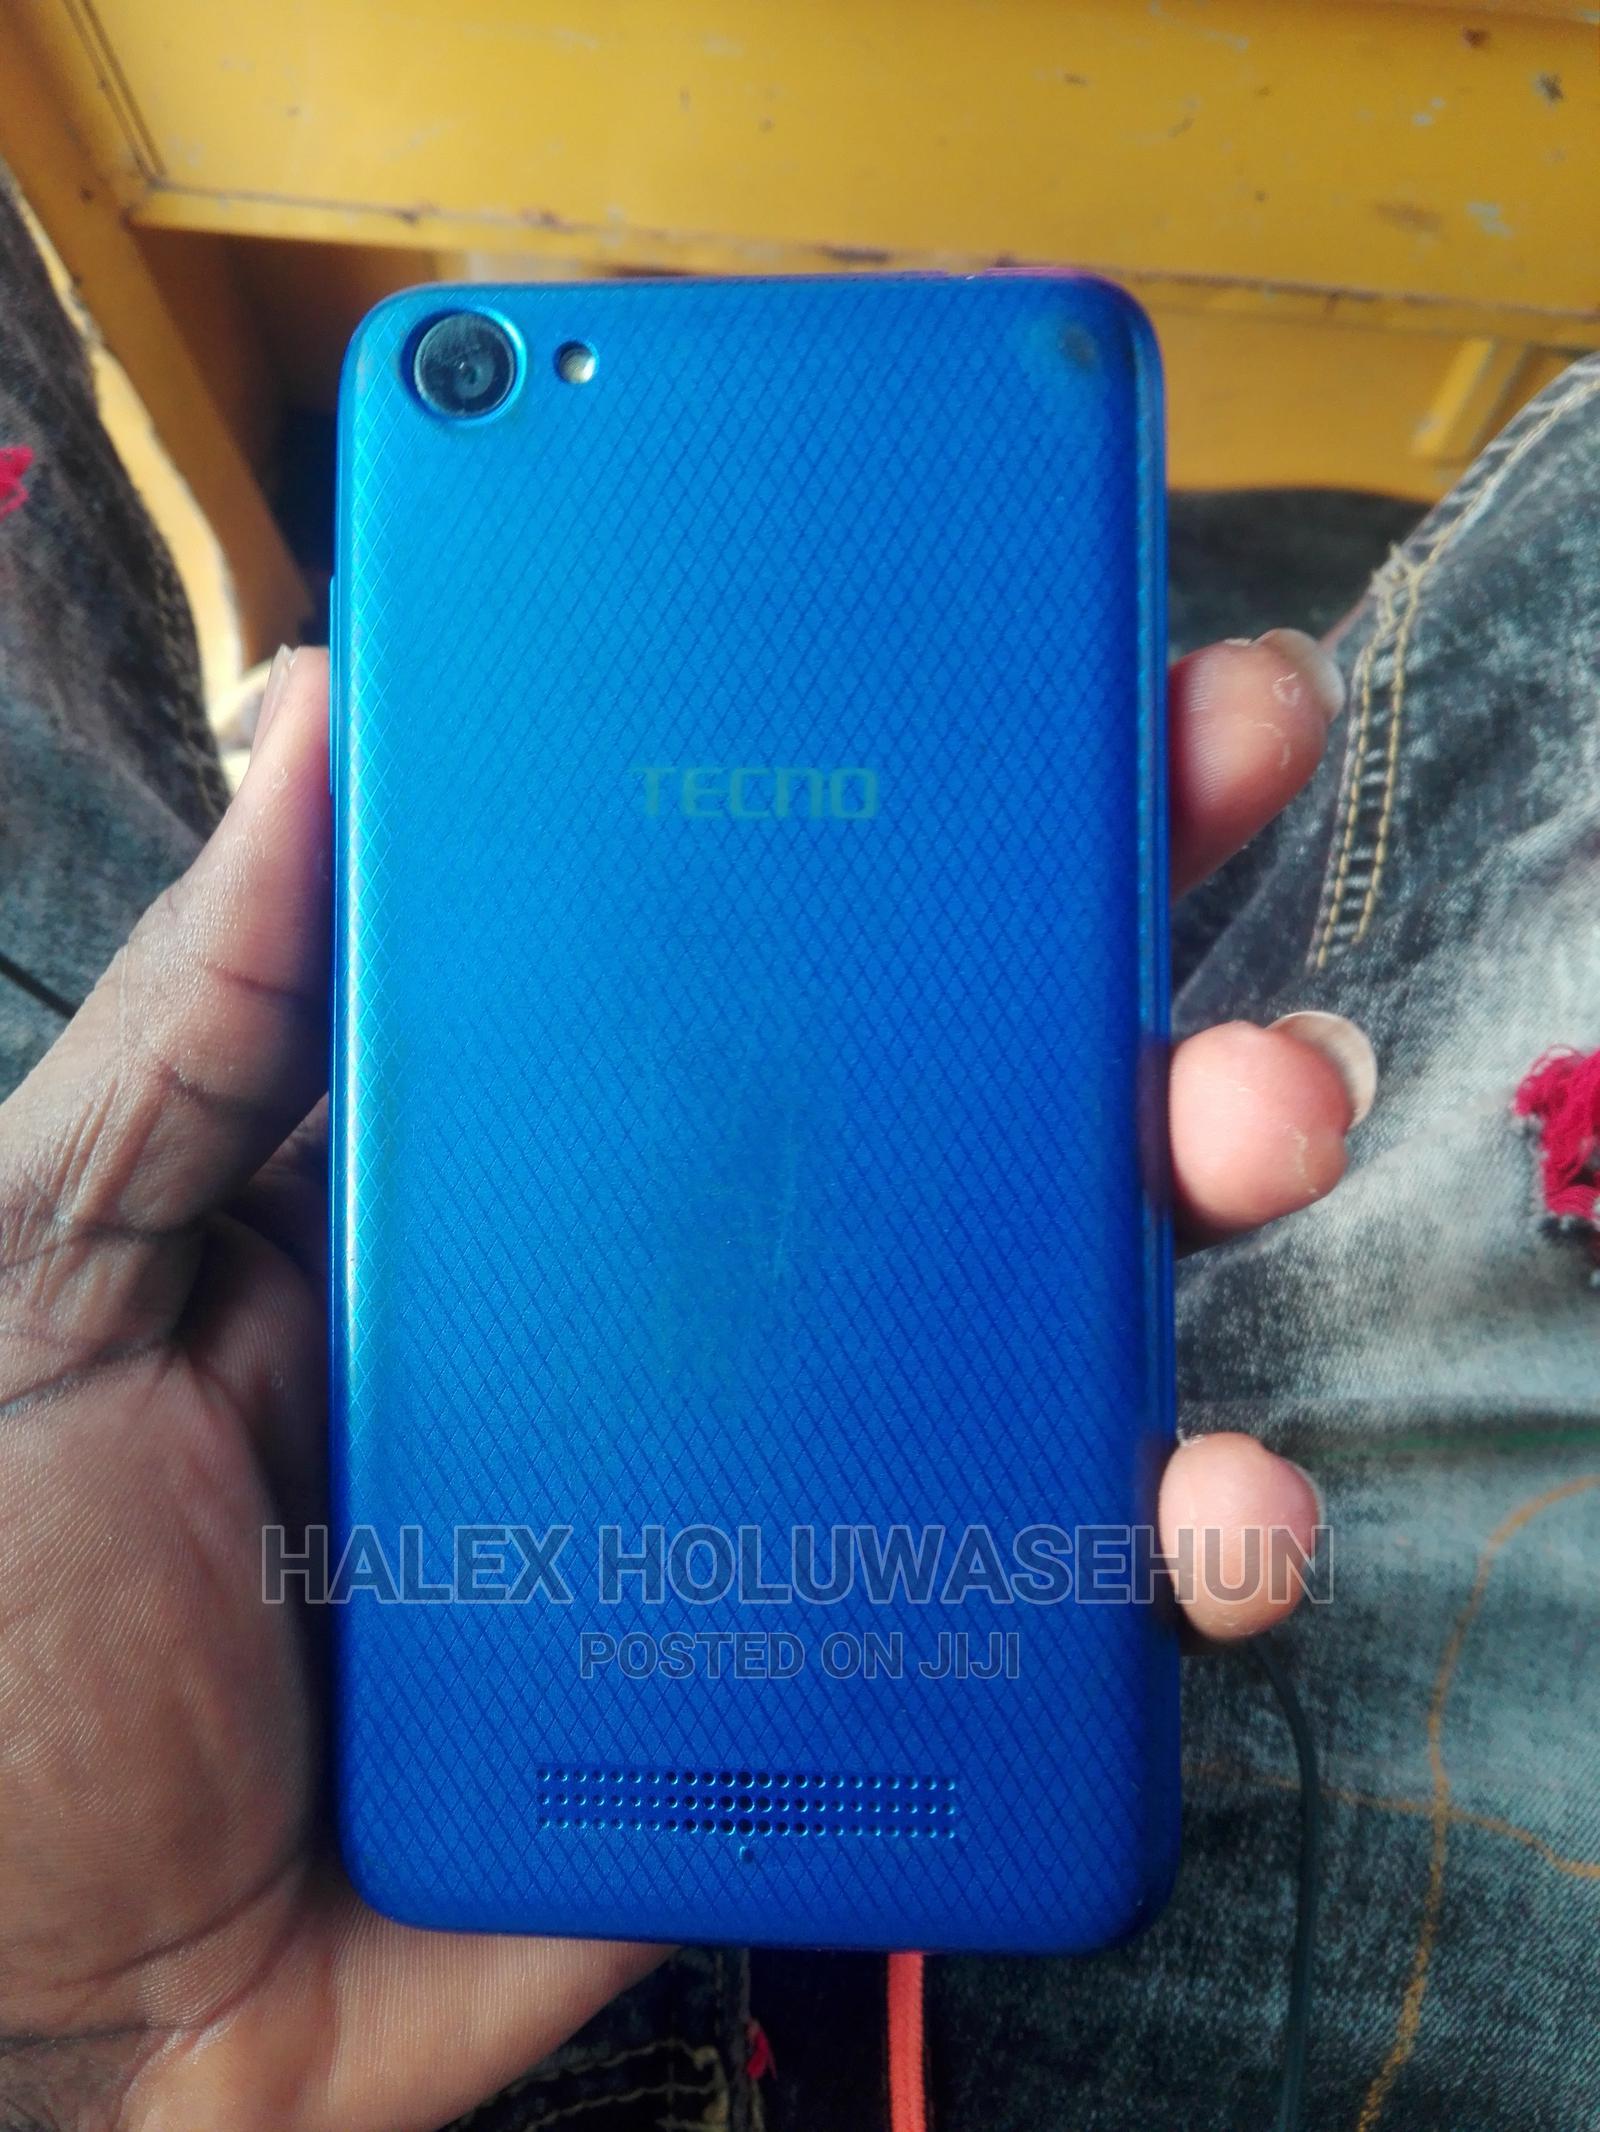 Archive: New Tecno WX3 8 GB Blue